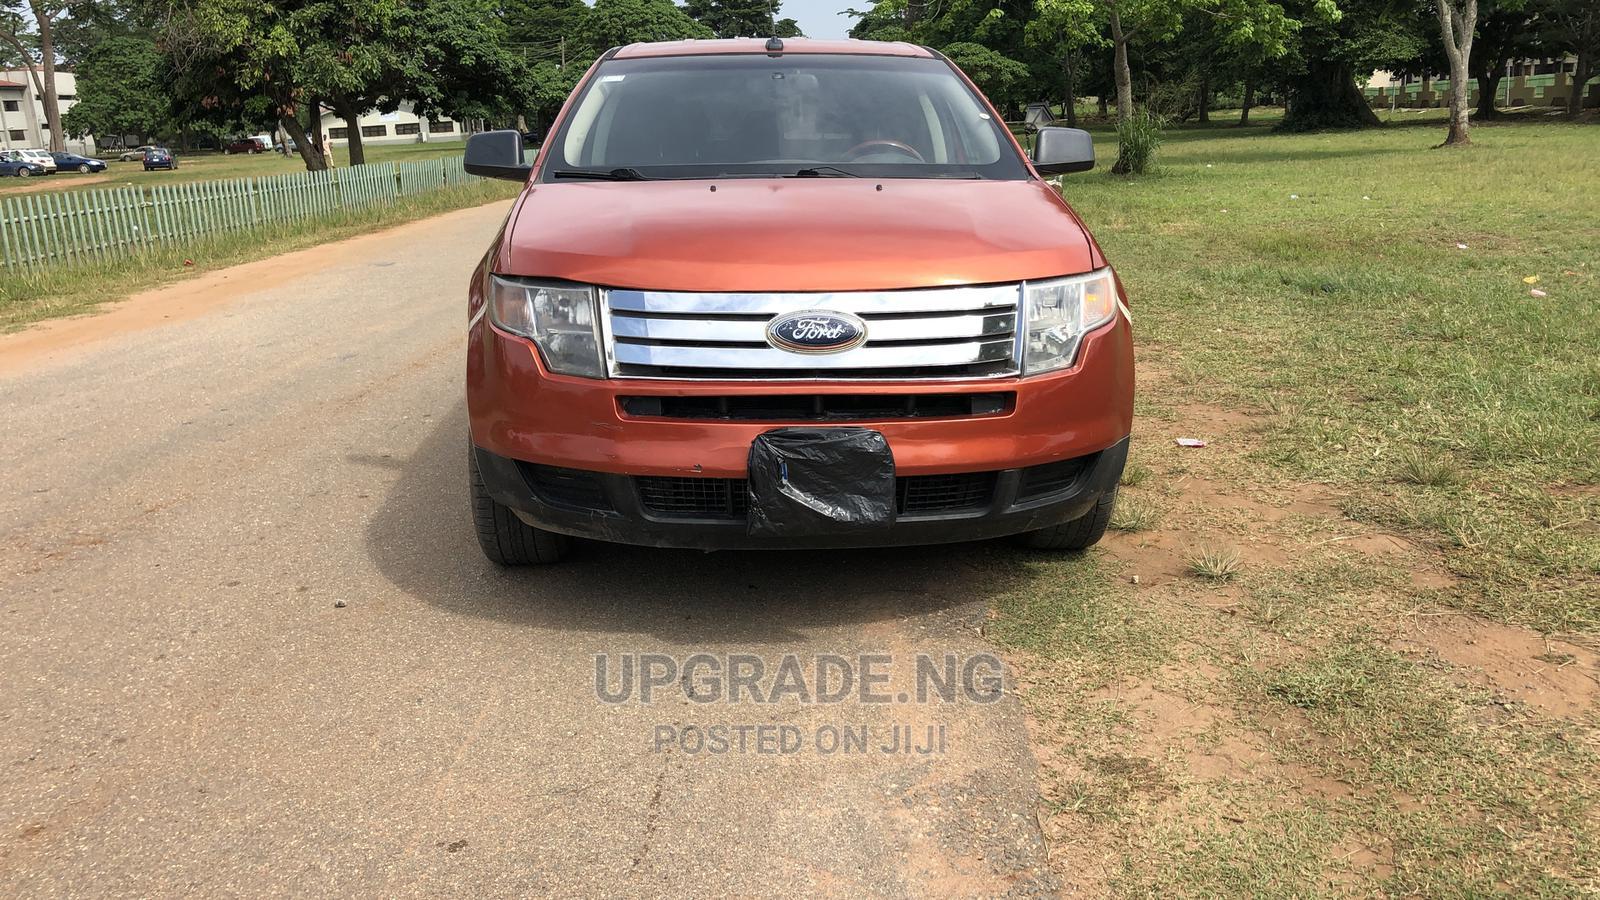 Archive: Ford Edge 2008 SE 4dr FWD (3.5L 6cyl 6A) Orange